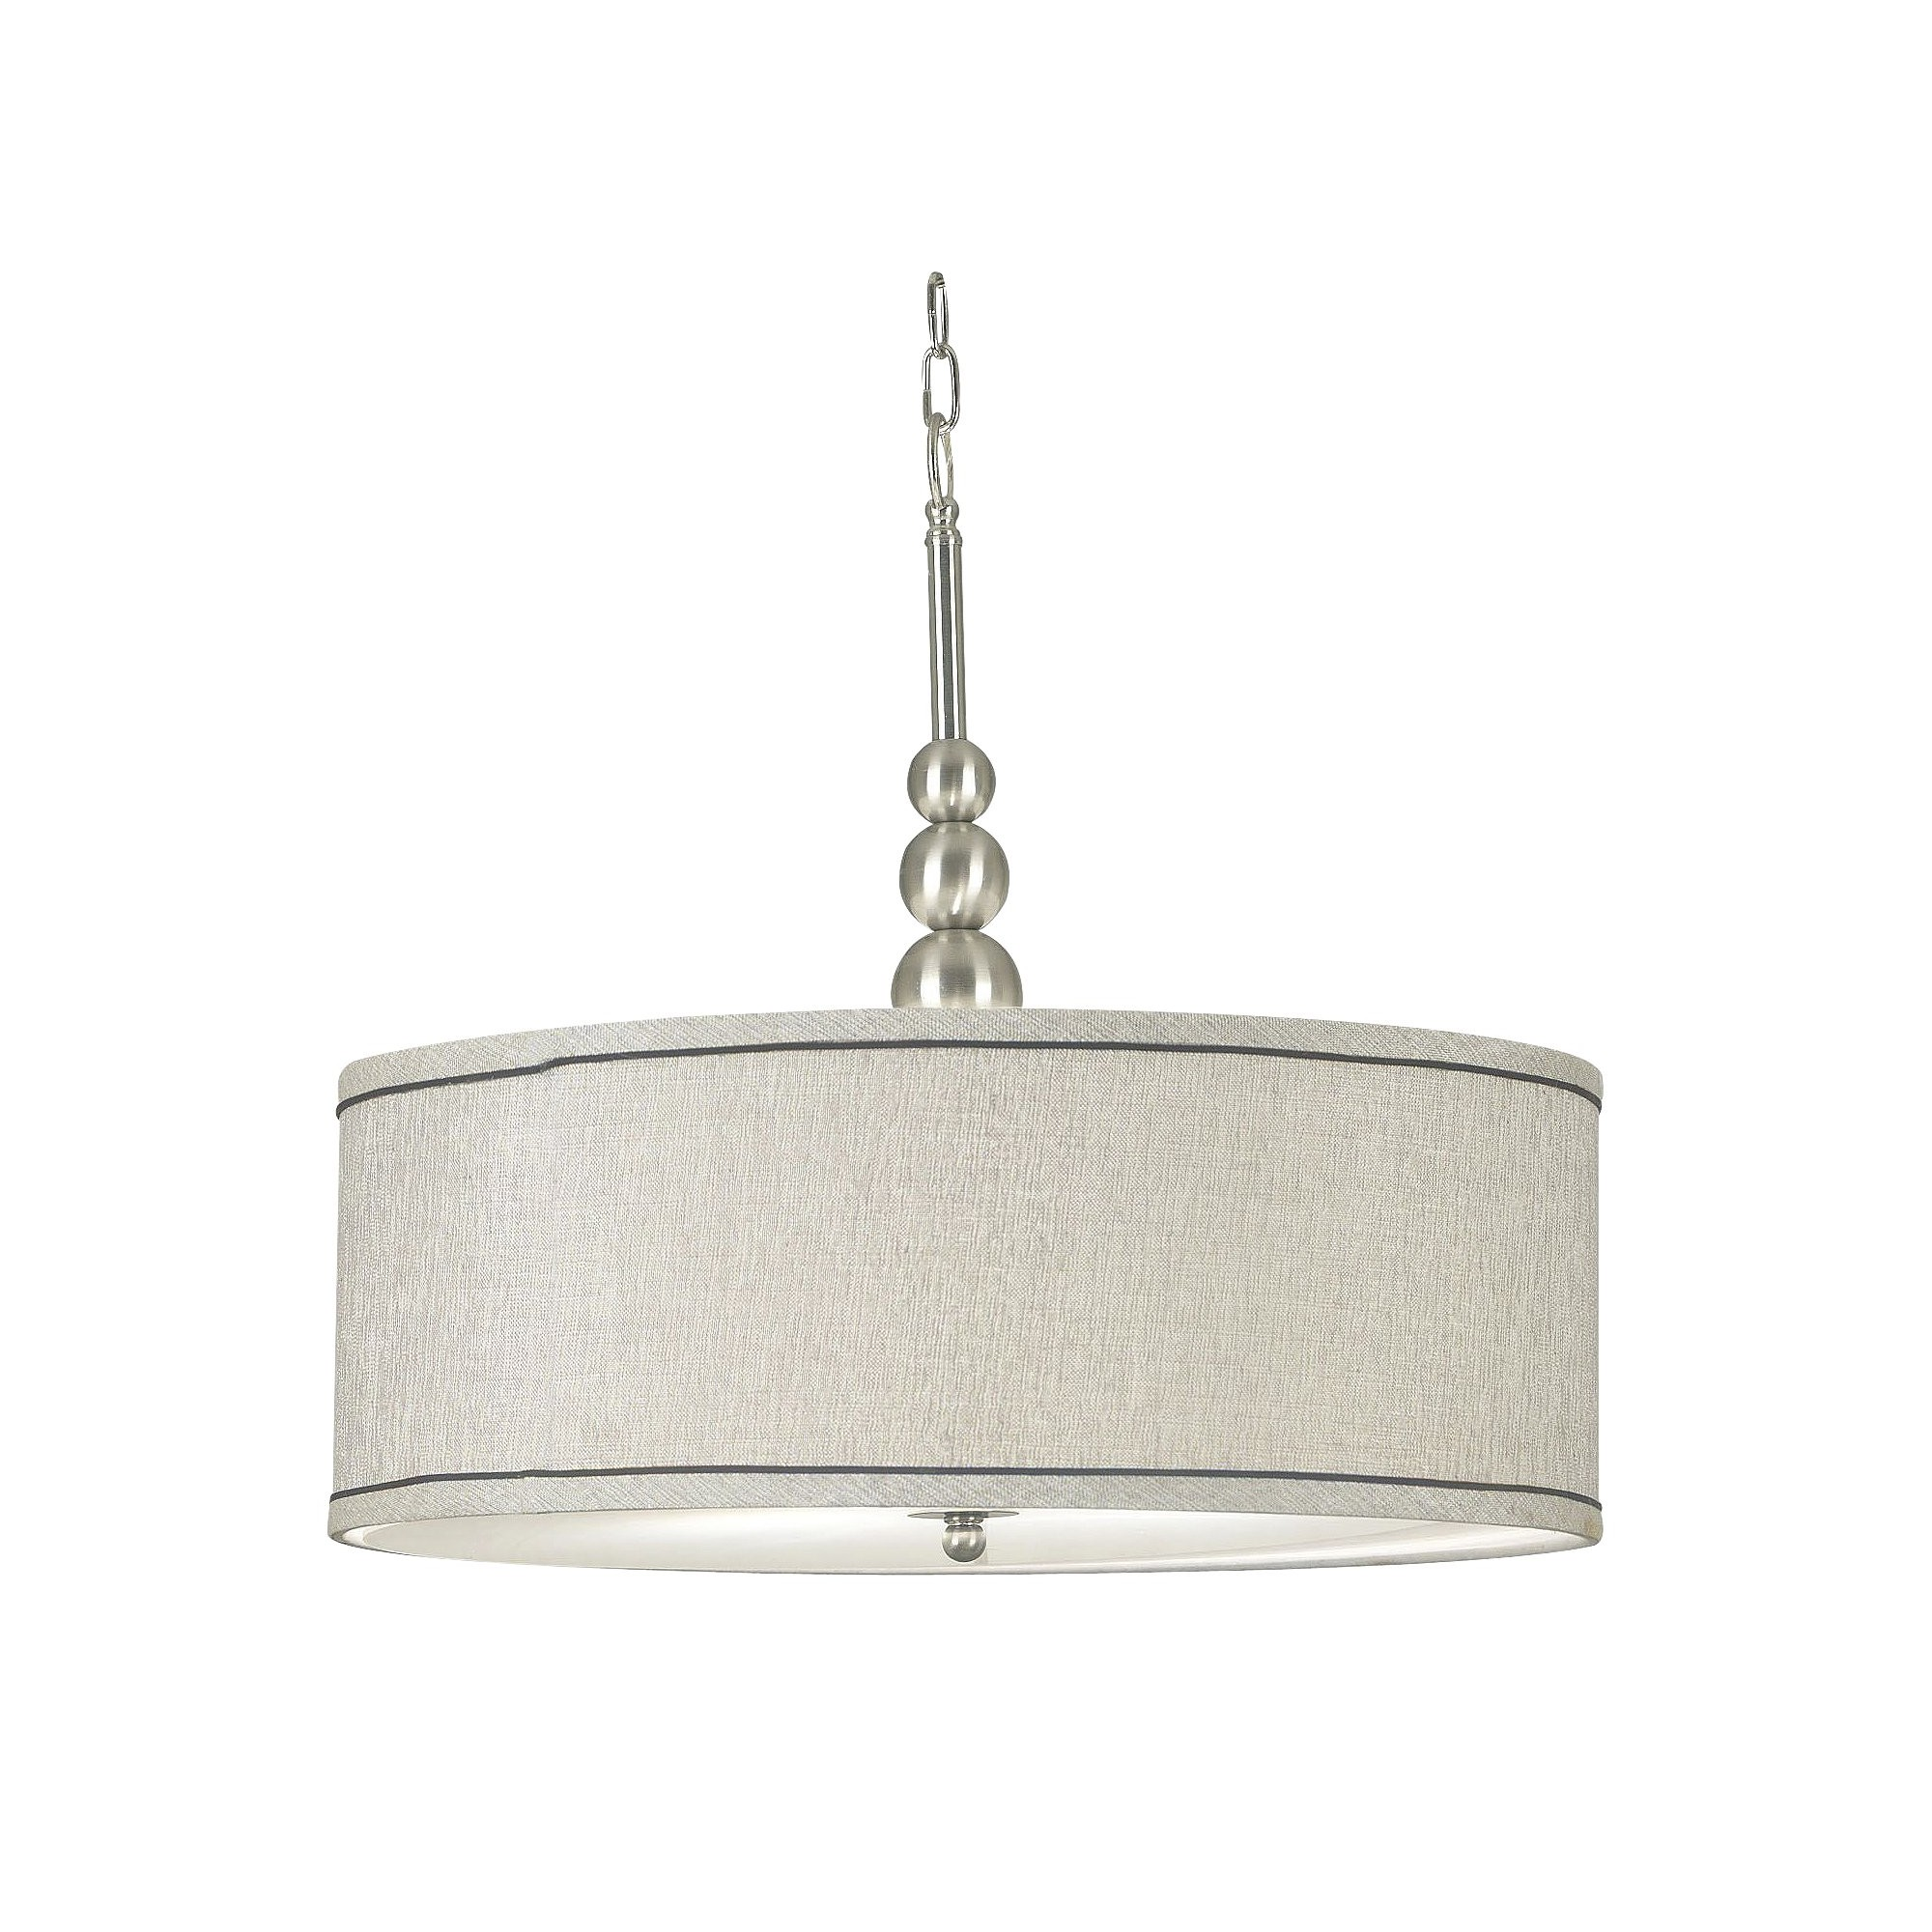 Kenroy Home Brushed Steel Finish Margot 3 Light Pendant